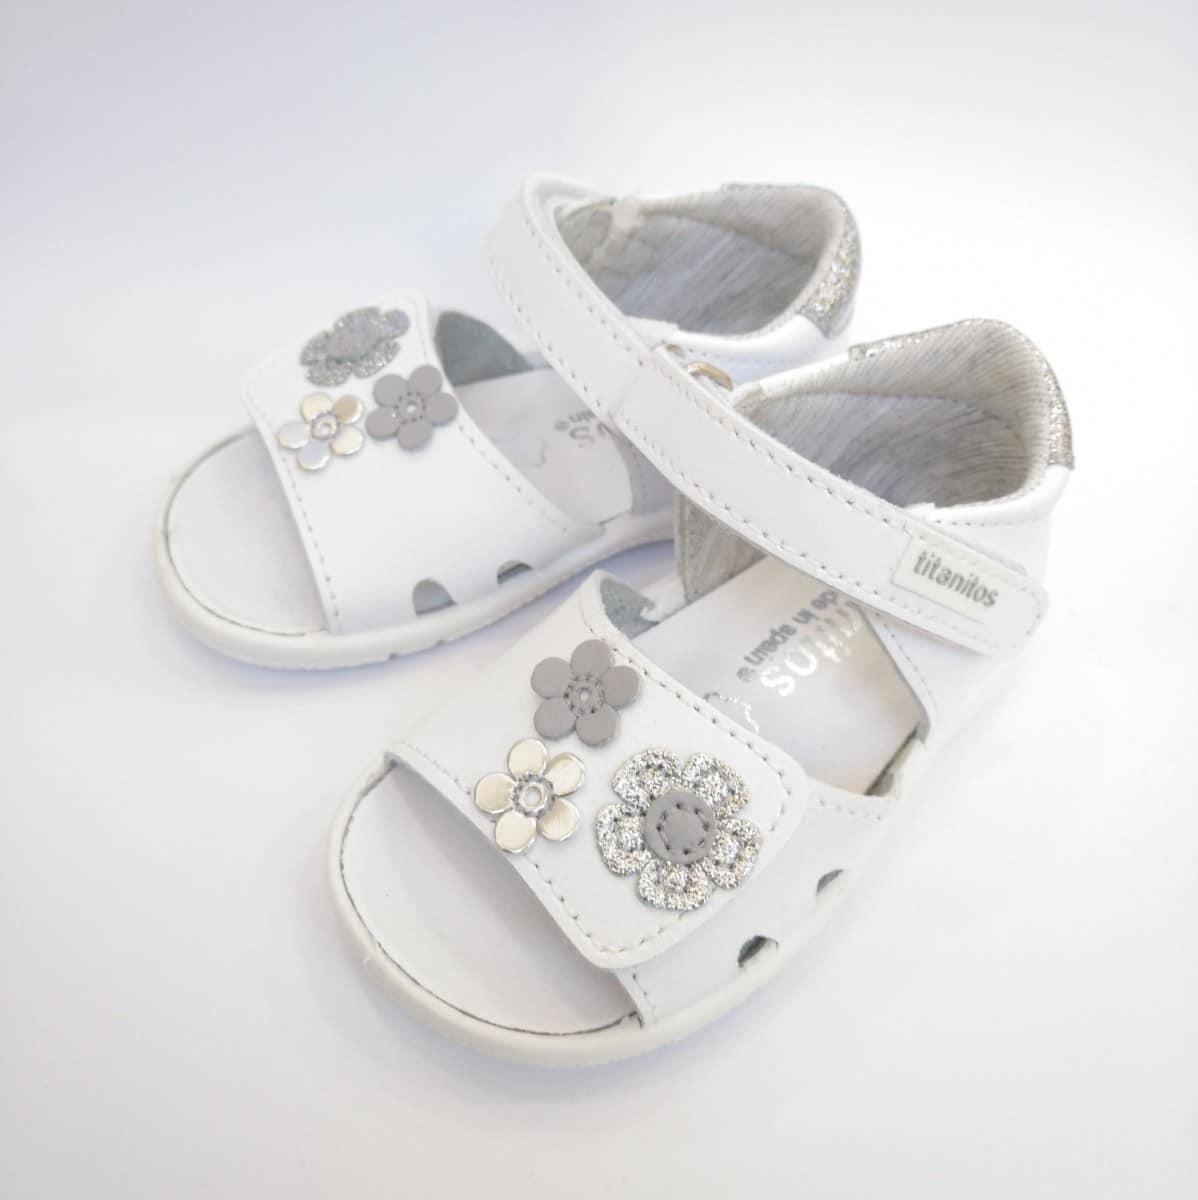 c501f65ee Sandalia Blanca Lavable Flores Velcro marca Titanitos   Zapatines